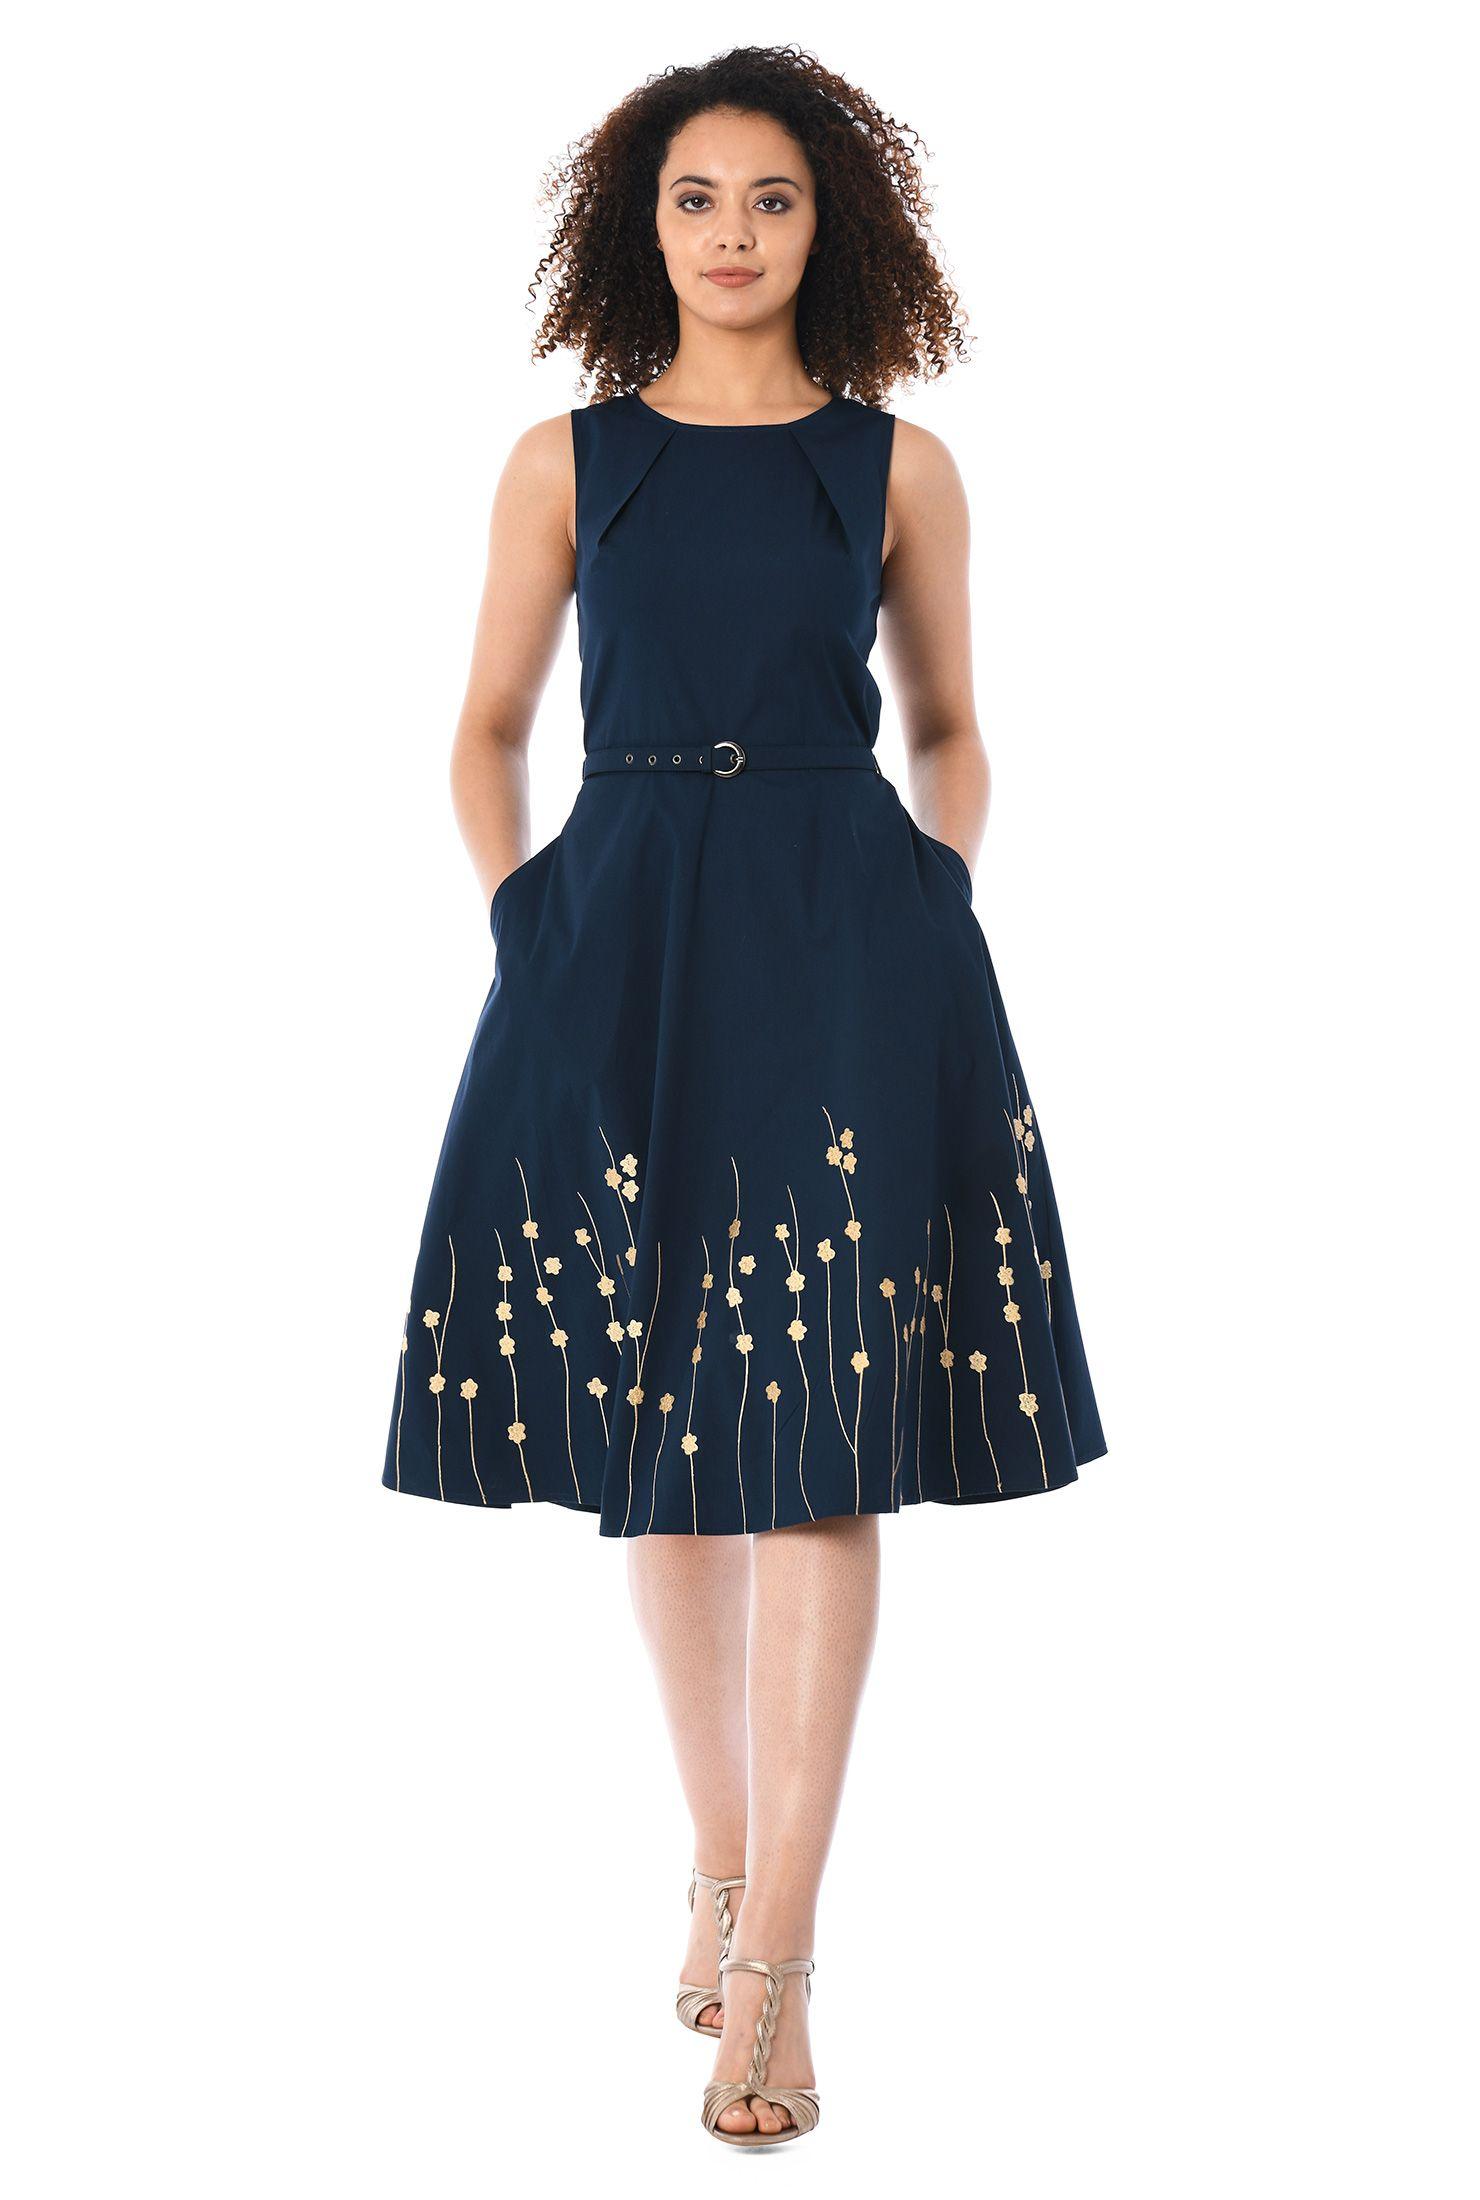 Back zip dresses below knee length dresses belt dresses cotton